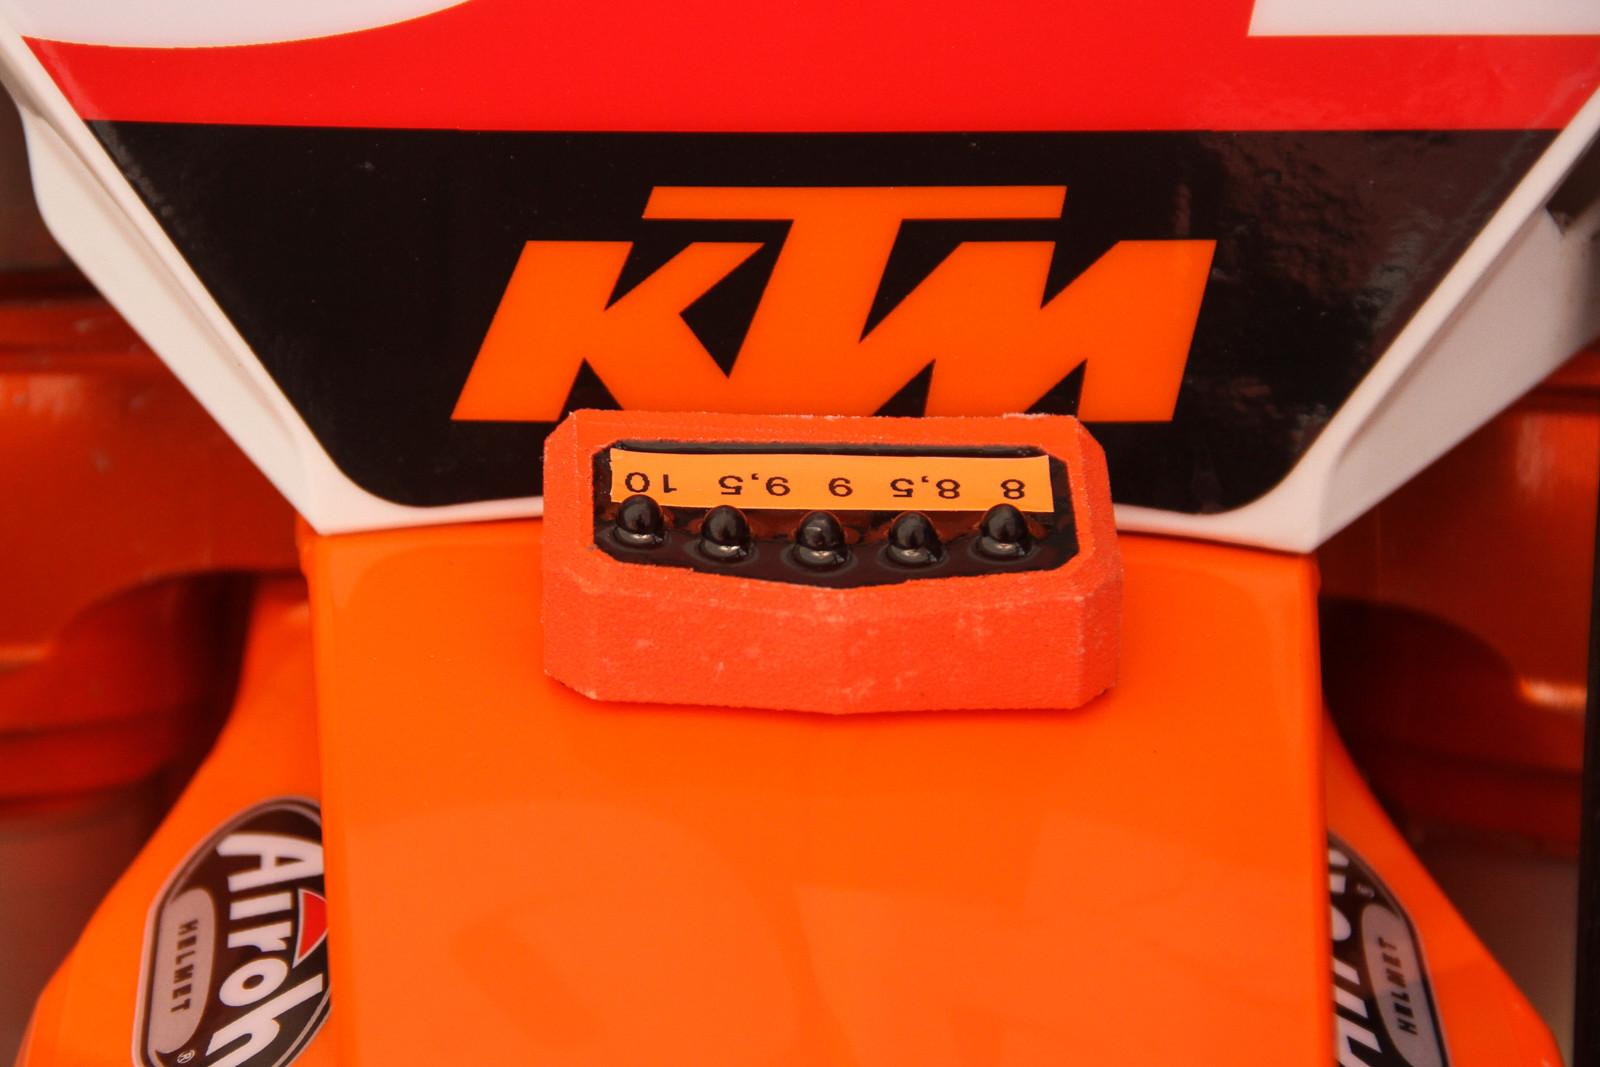 KTM's RPM start counter aboard their 450 SX-Fs. 8,000 PRM, 8,500 RPM, 9,000 RPM, etc.